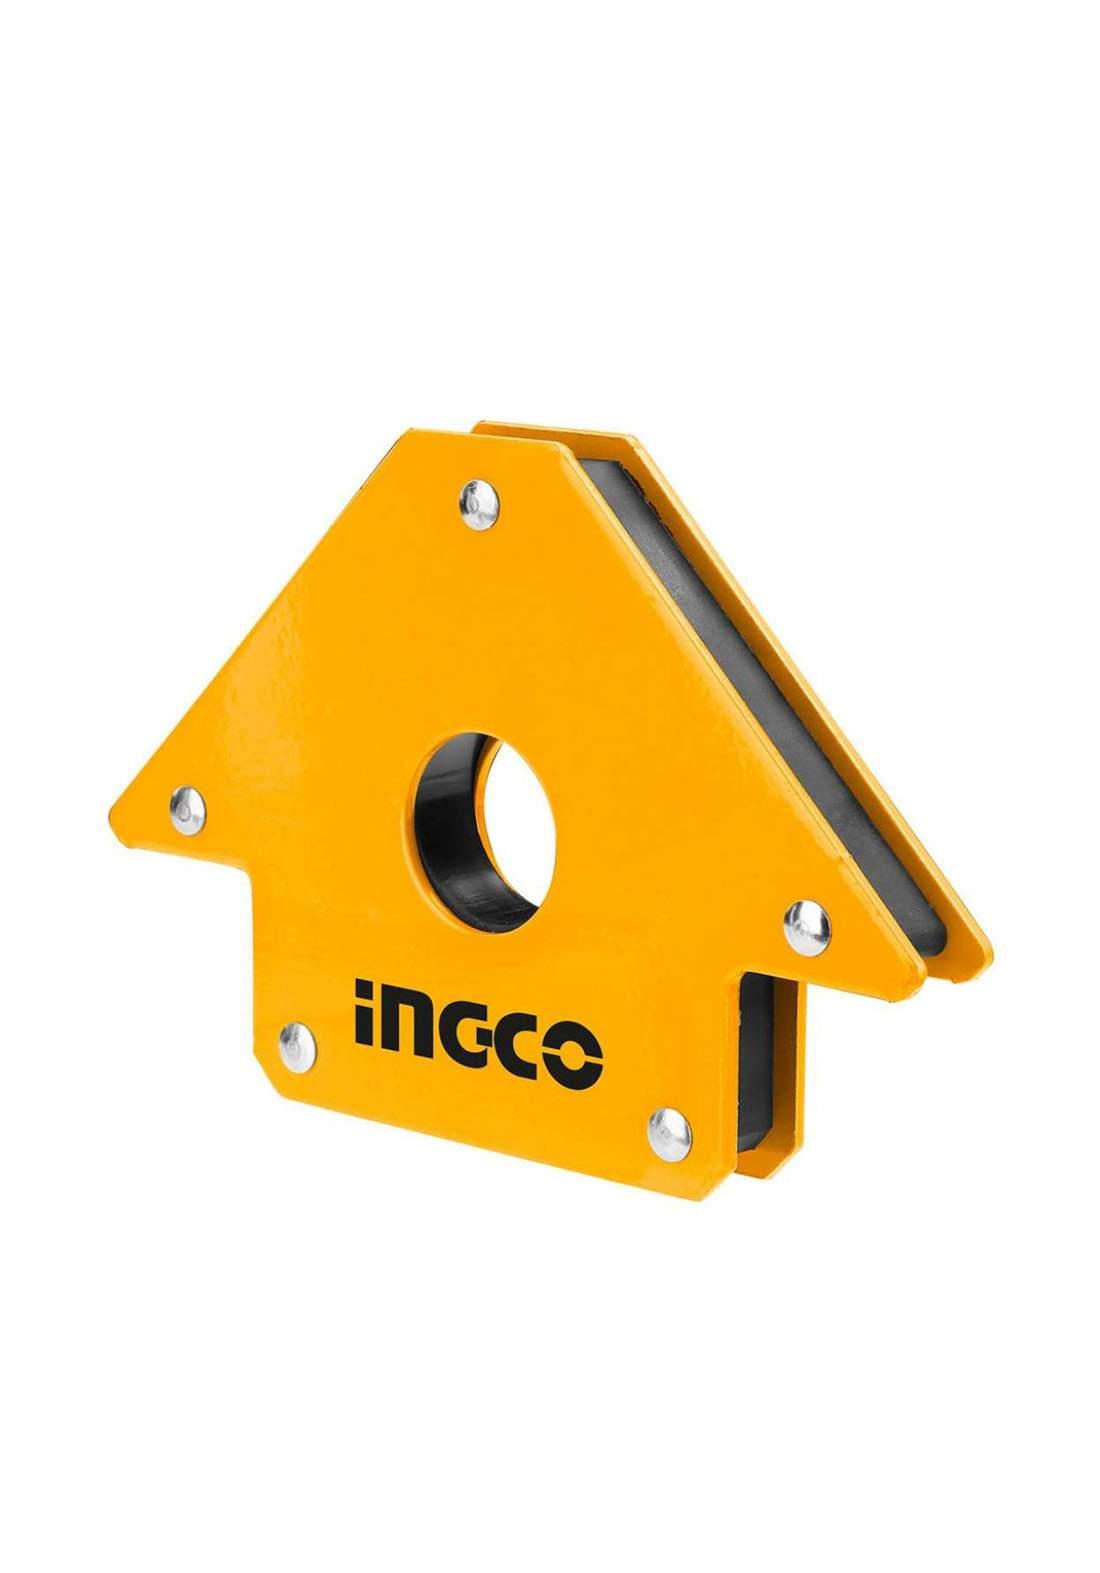 "Ingco AMWH50041 Magnetic Welding Holder 4"" حامل لحام مغناطيسي"